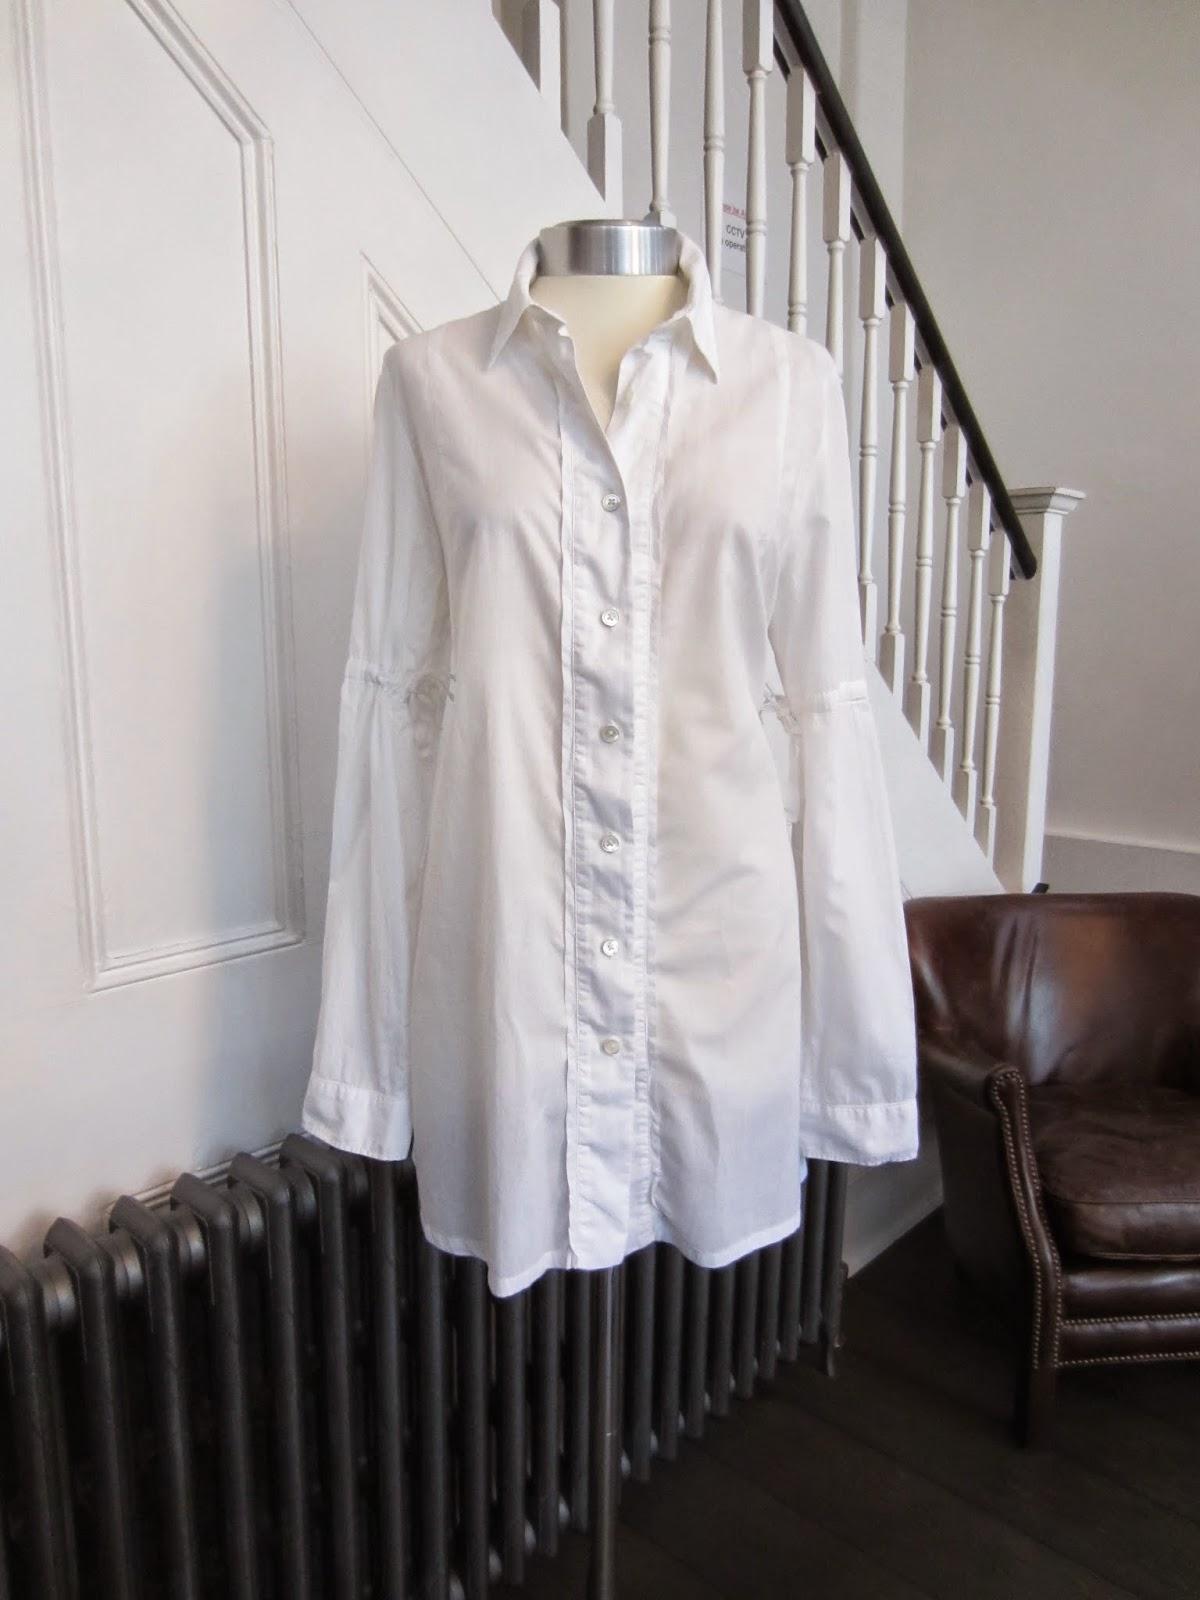 Ann Demeulemeester White Shirt